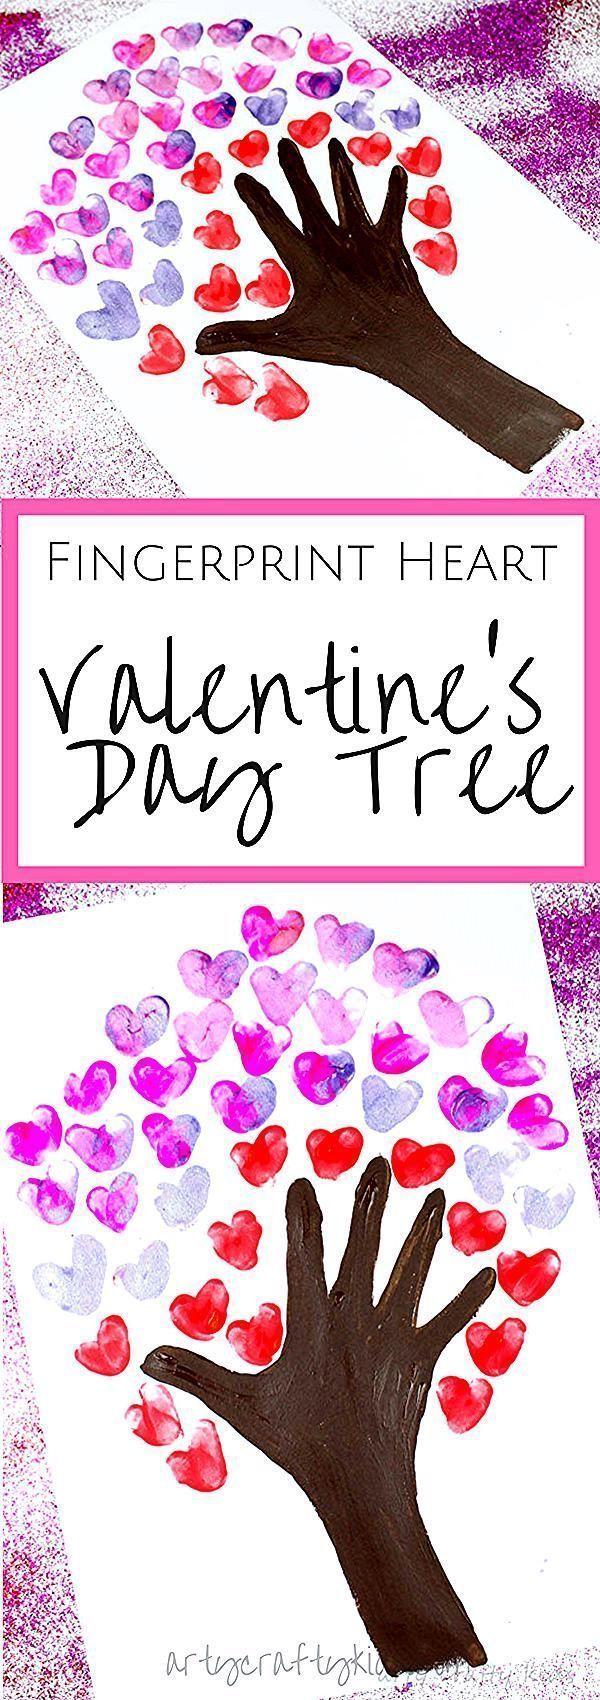 Arty Crafty Kids   Valentine's Day Crafts For Children Fingerprint Heart Valent ... -  Arty Crafty Kids   Valentine's Day crafts for kids fingerprint heart Valenti …, #Arty #Handc -